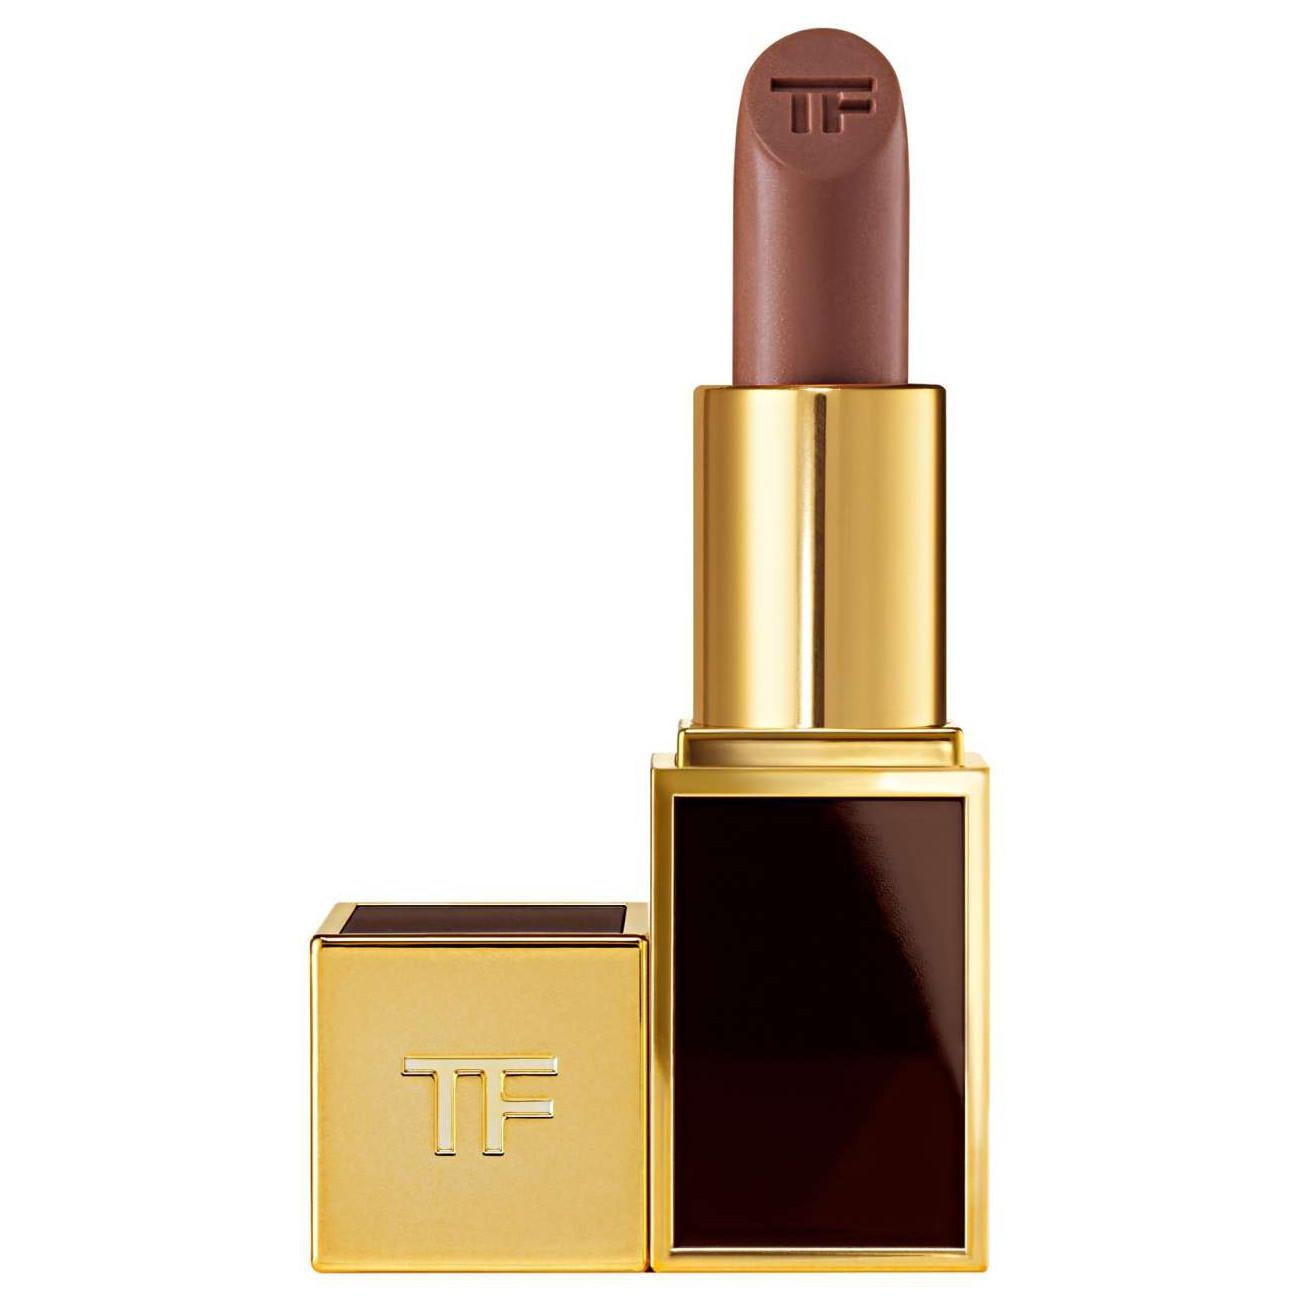 Tom Ford Lips & Boys Lip Color Pavlos 05